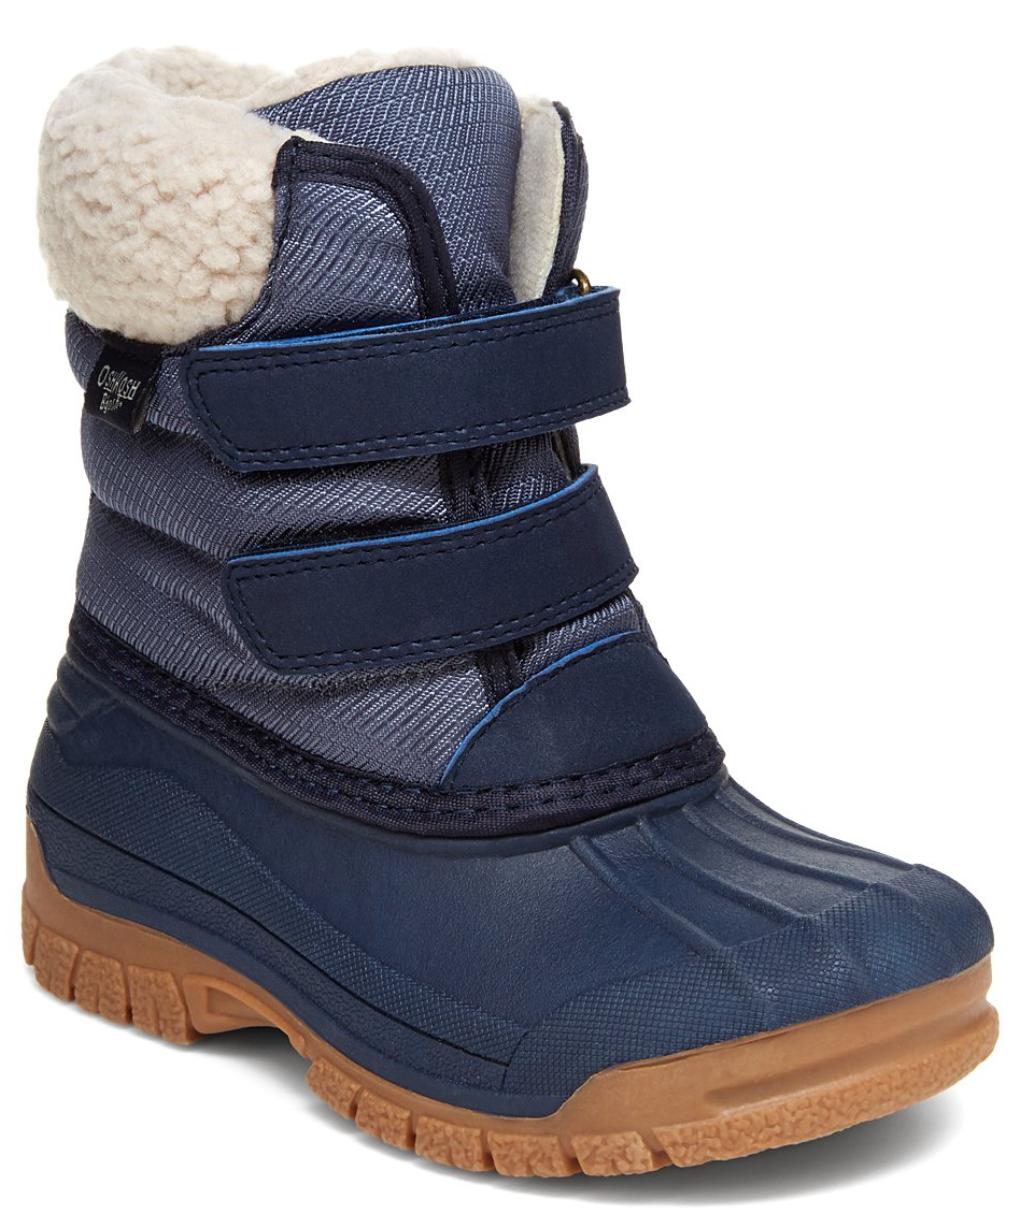 navy snow boots